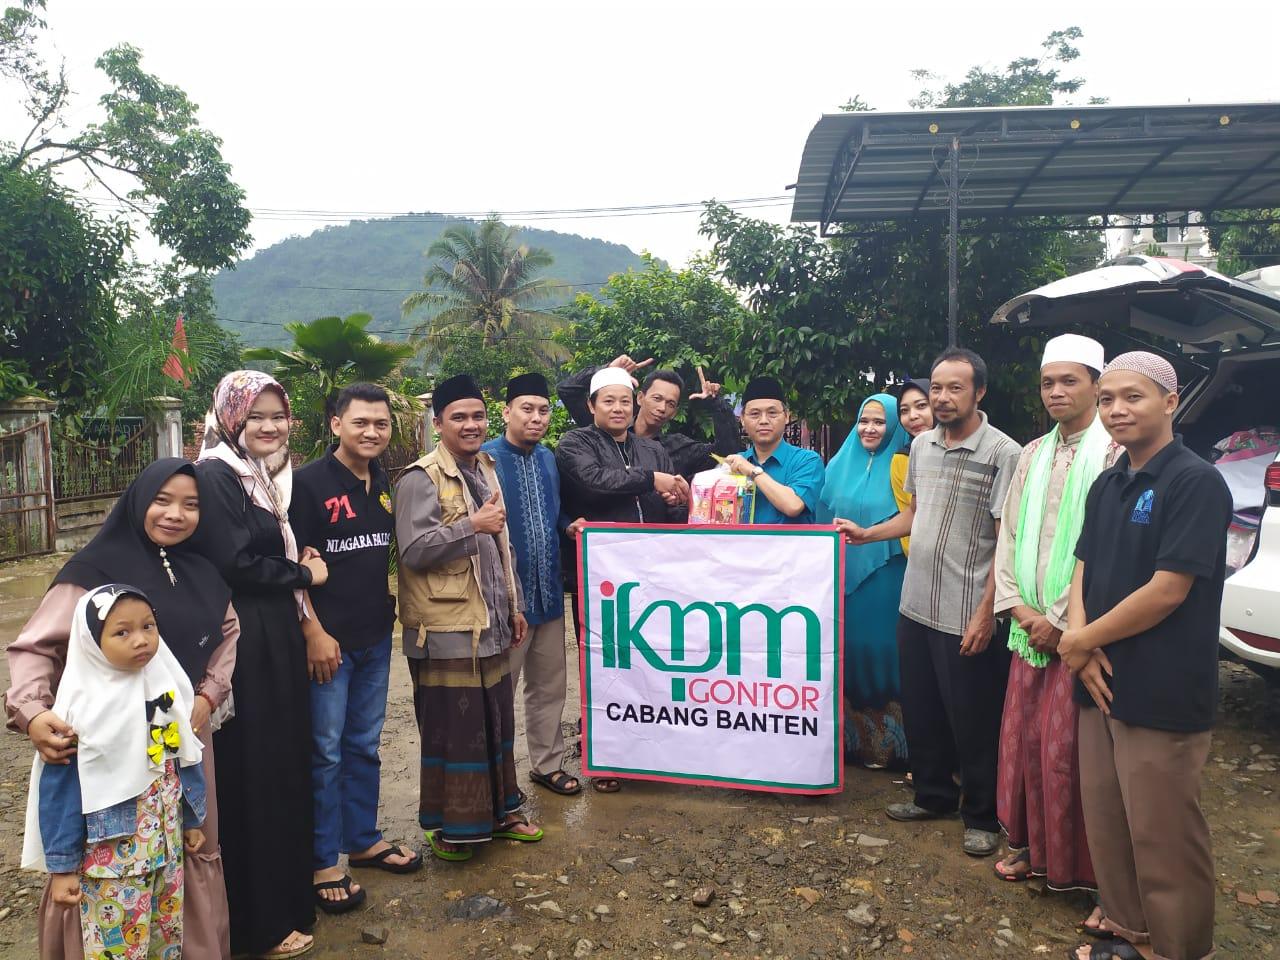 IKPM Gontor Cabang Banten Adakan Baksos Bantu Korban Bencana Banjir di Lebak